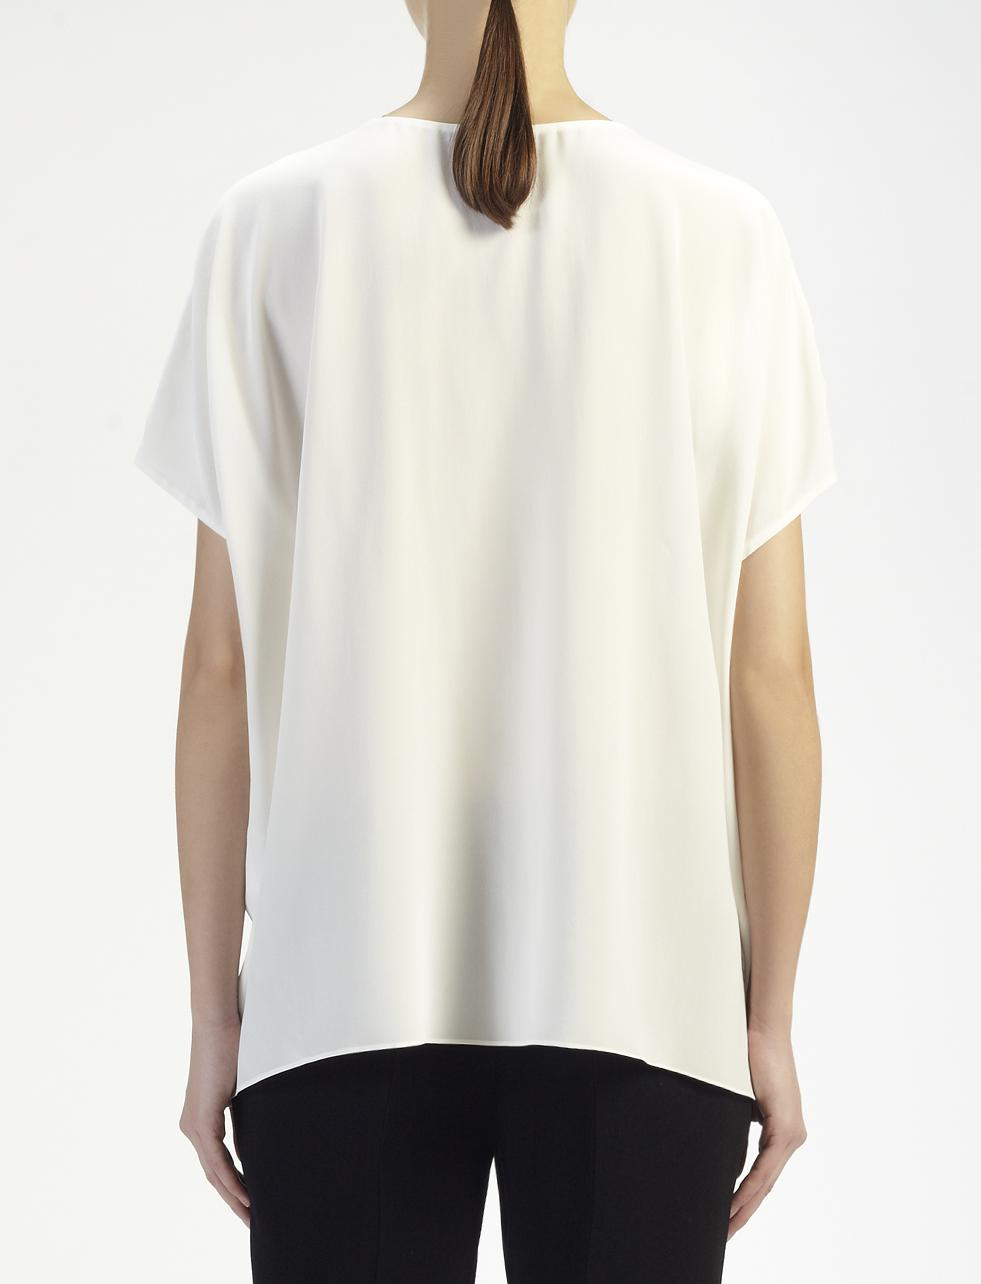 lyst joseph crepe de chine new pull blouse in white. Black Bedroom Furniture Sets. Home Design Ideas